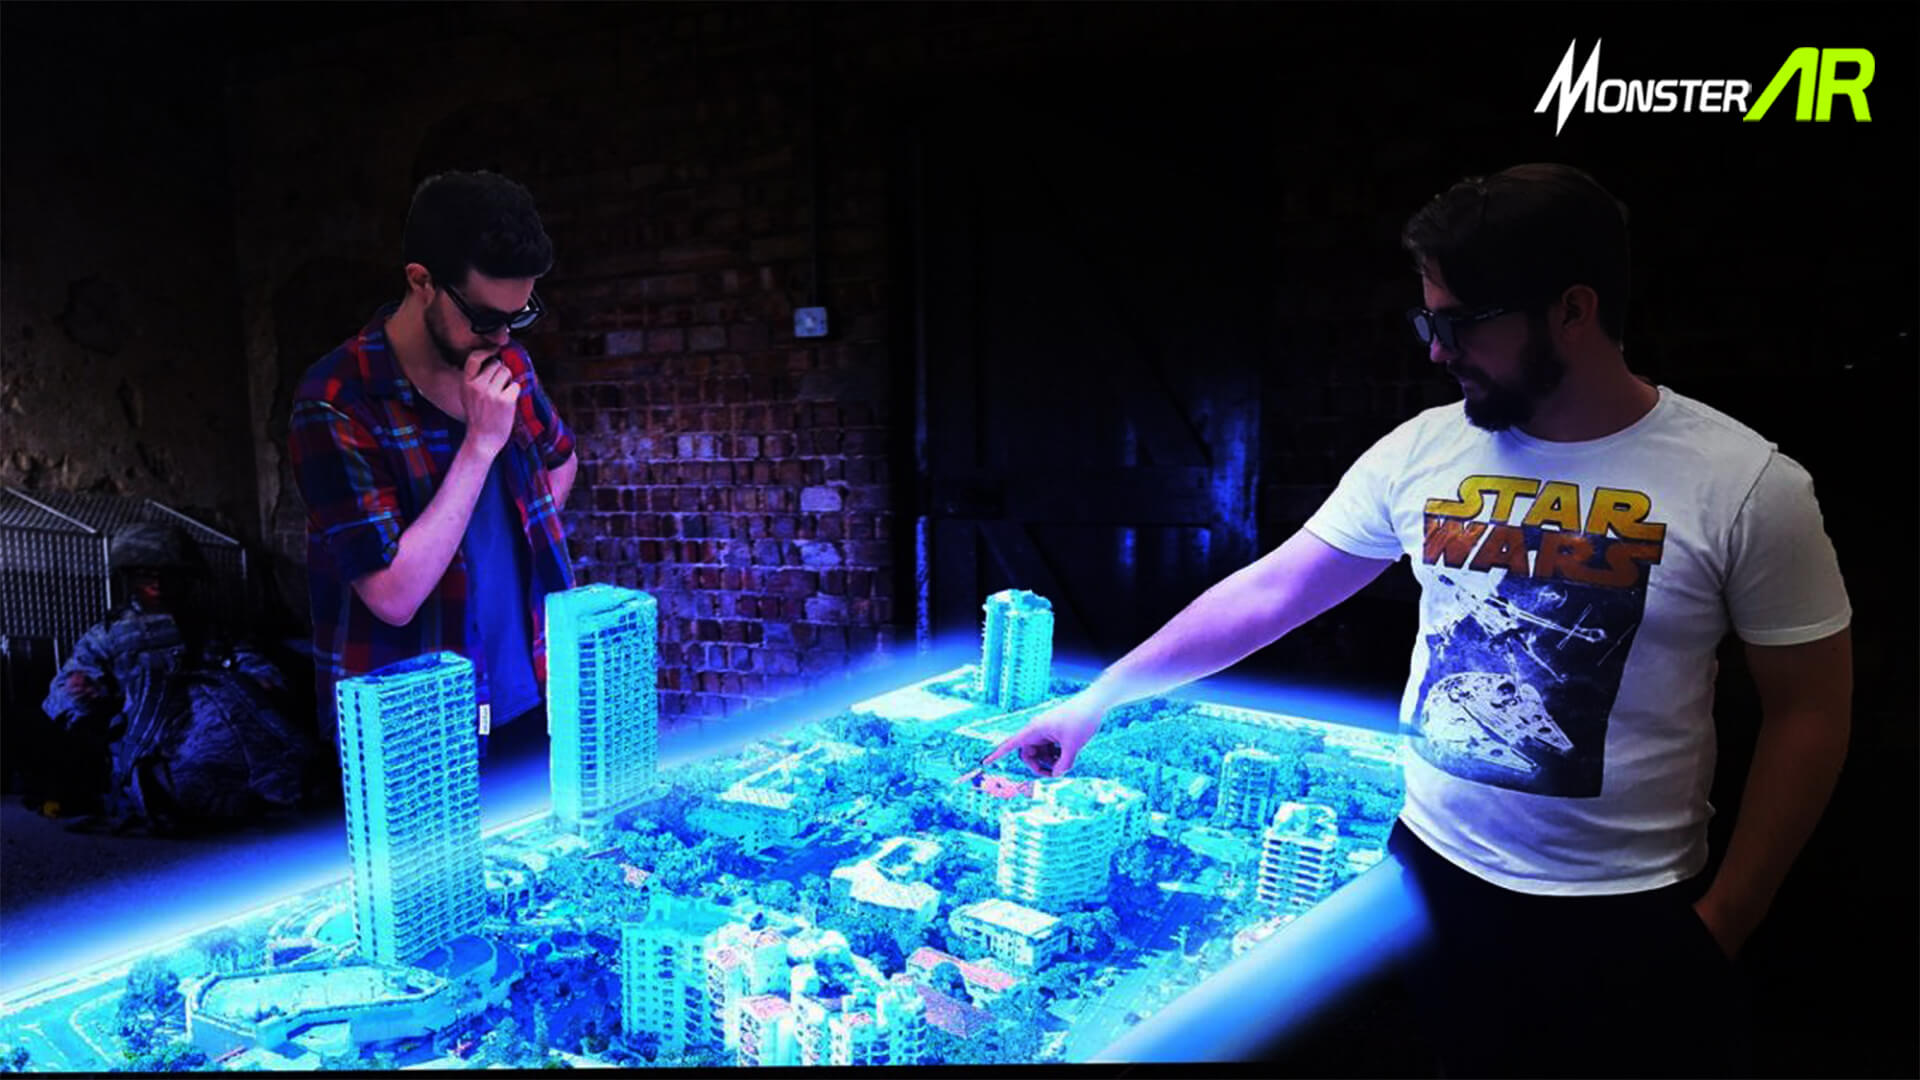 teknologi hologram projection